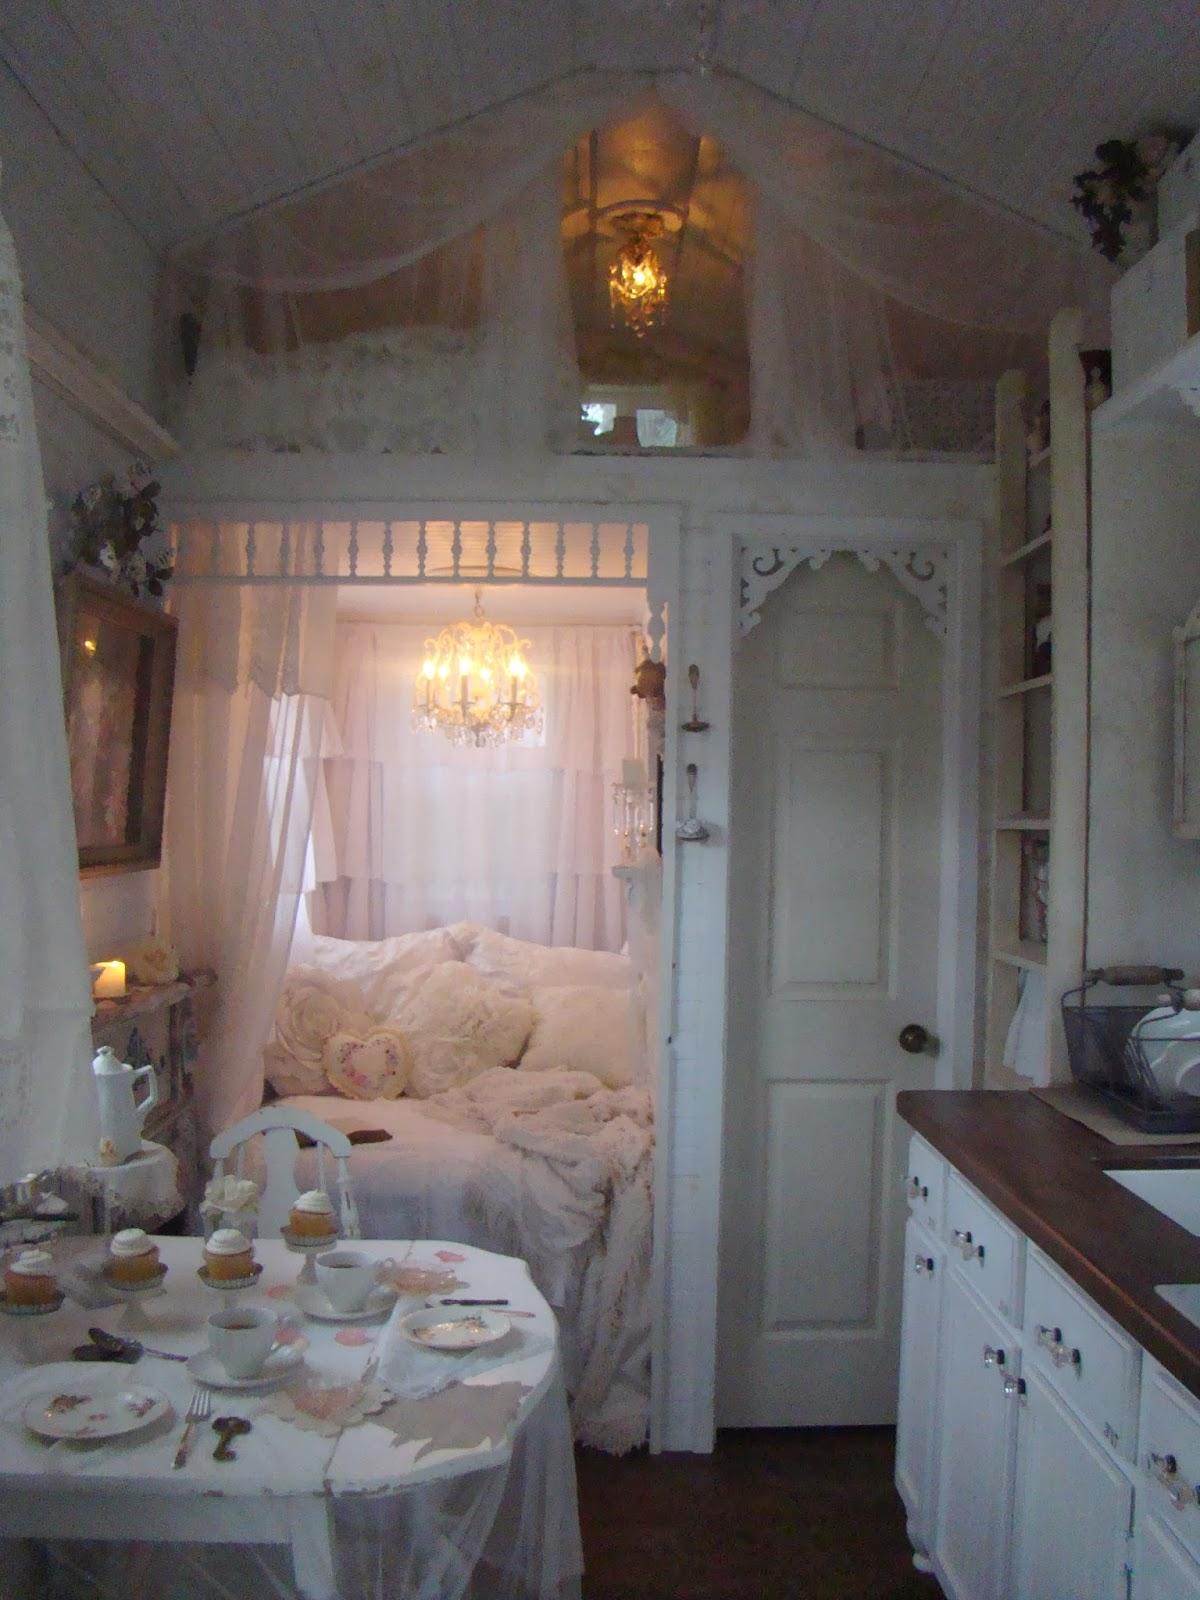 Shabby chic tiny retreat tea for two in my sweet retreat - Tiny house decorating ideas ...